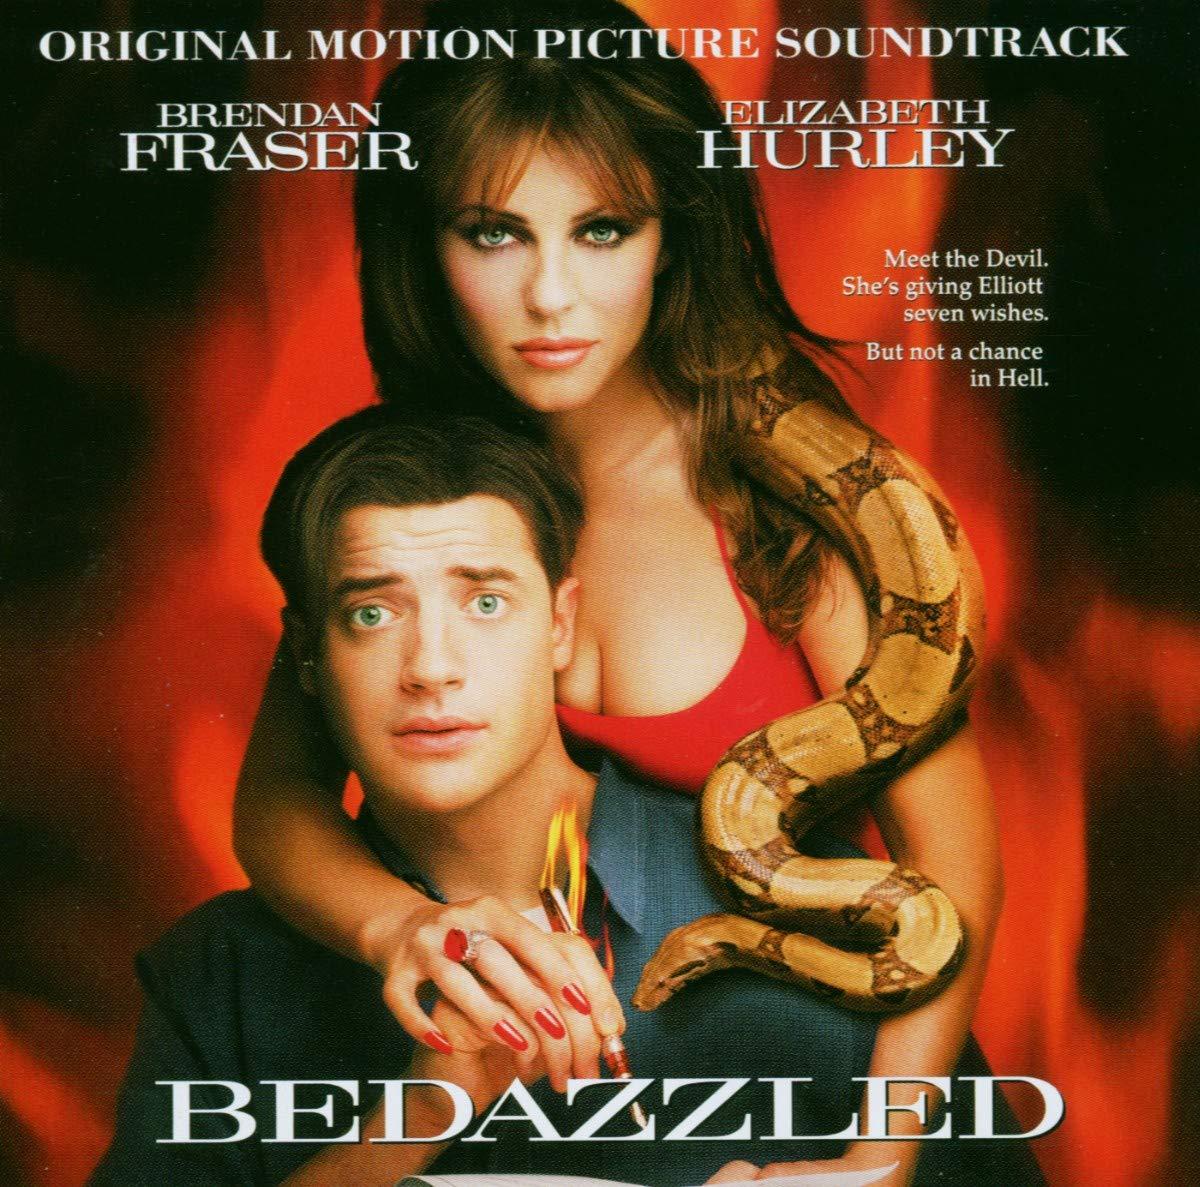 VA – Original Motion Picture Soundtrack Bedazzled (2000) [FLAC]